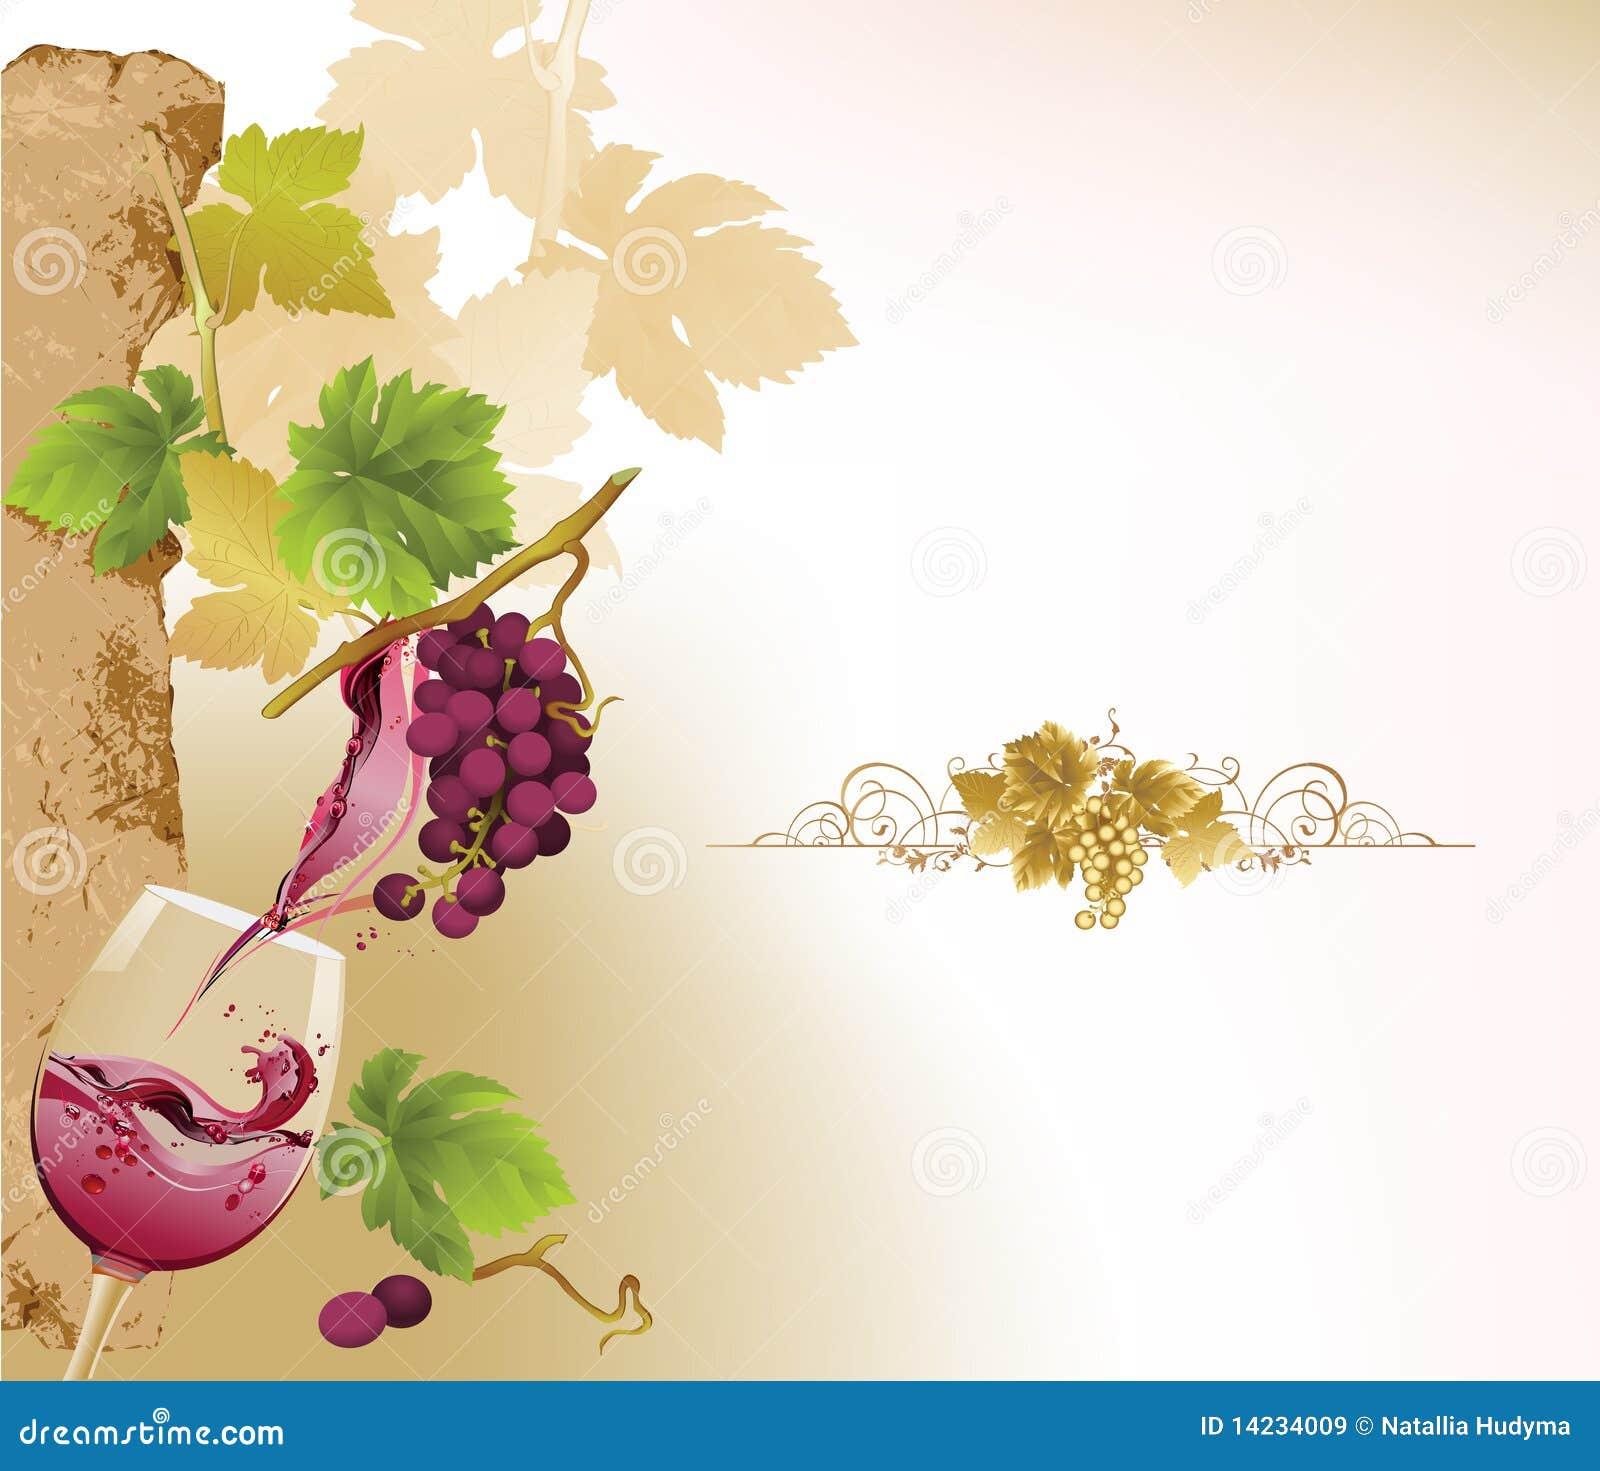 Design for wine list.